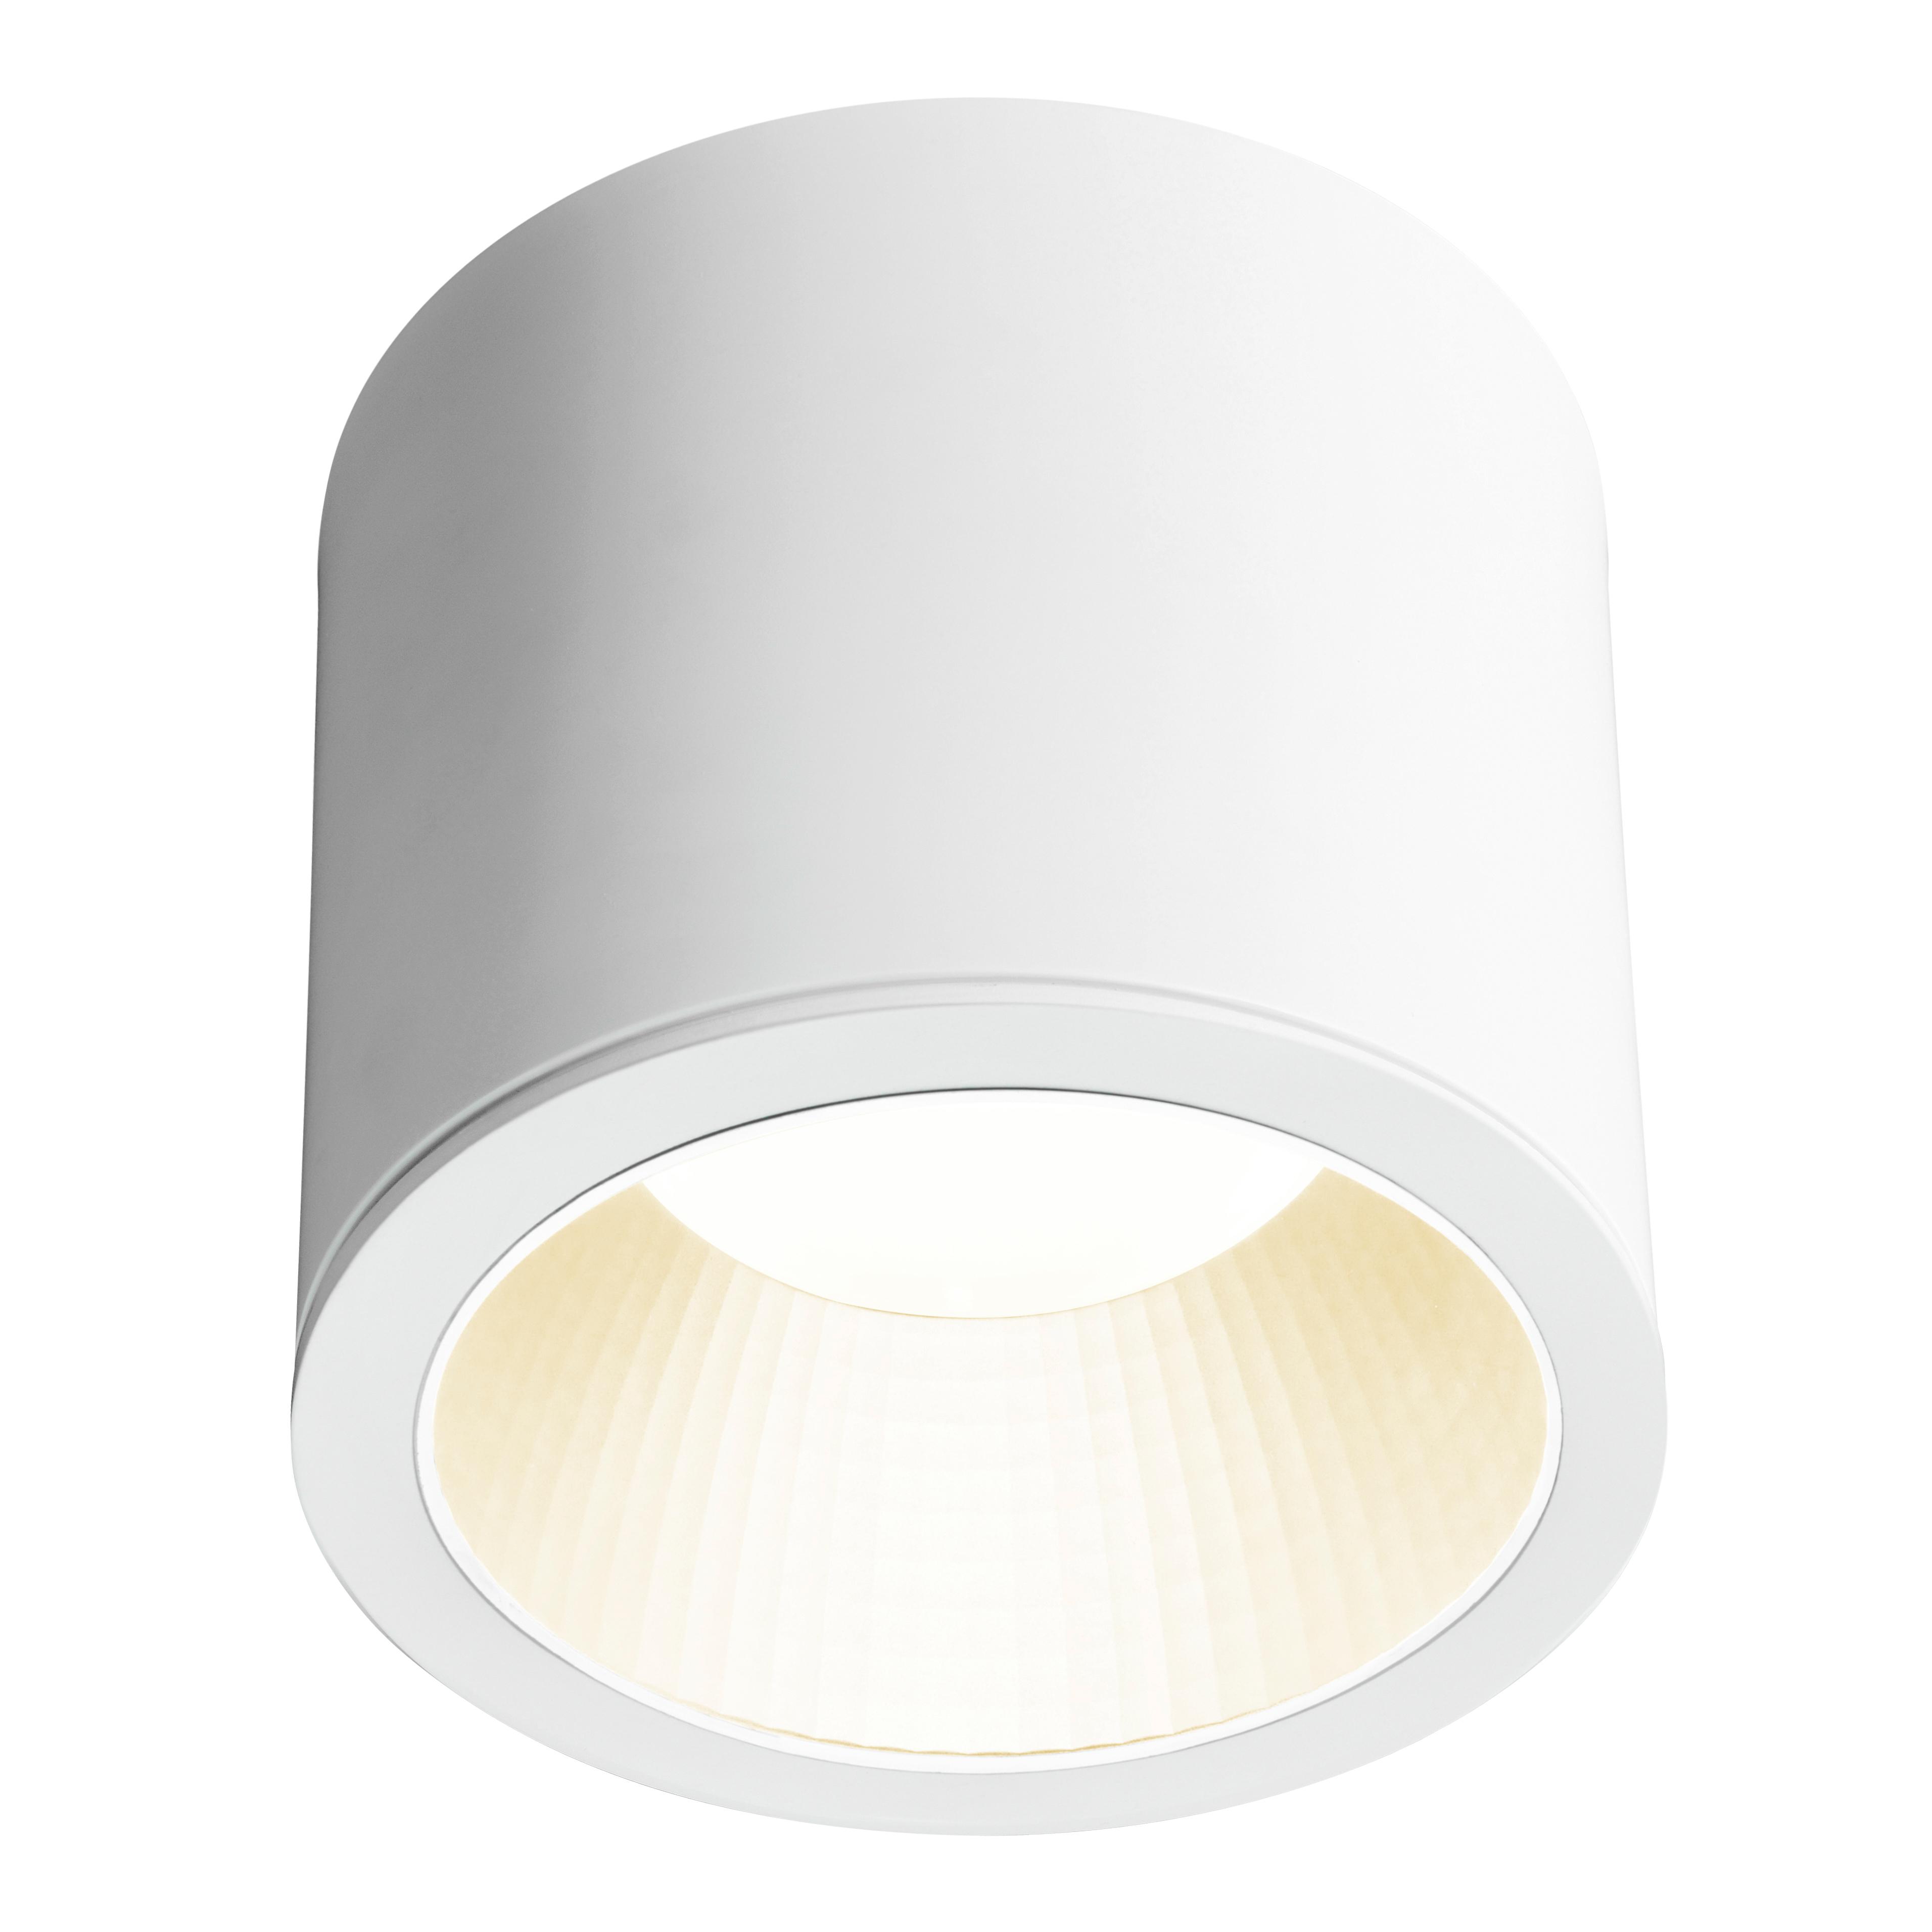 SOLINA 242 LED 24W 2500lm/840 MAT IP20 70° weiß GEN.2